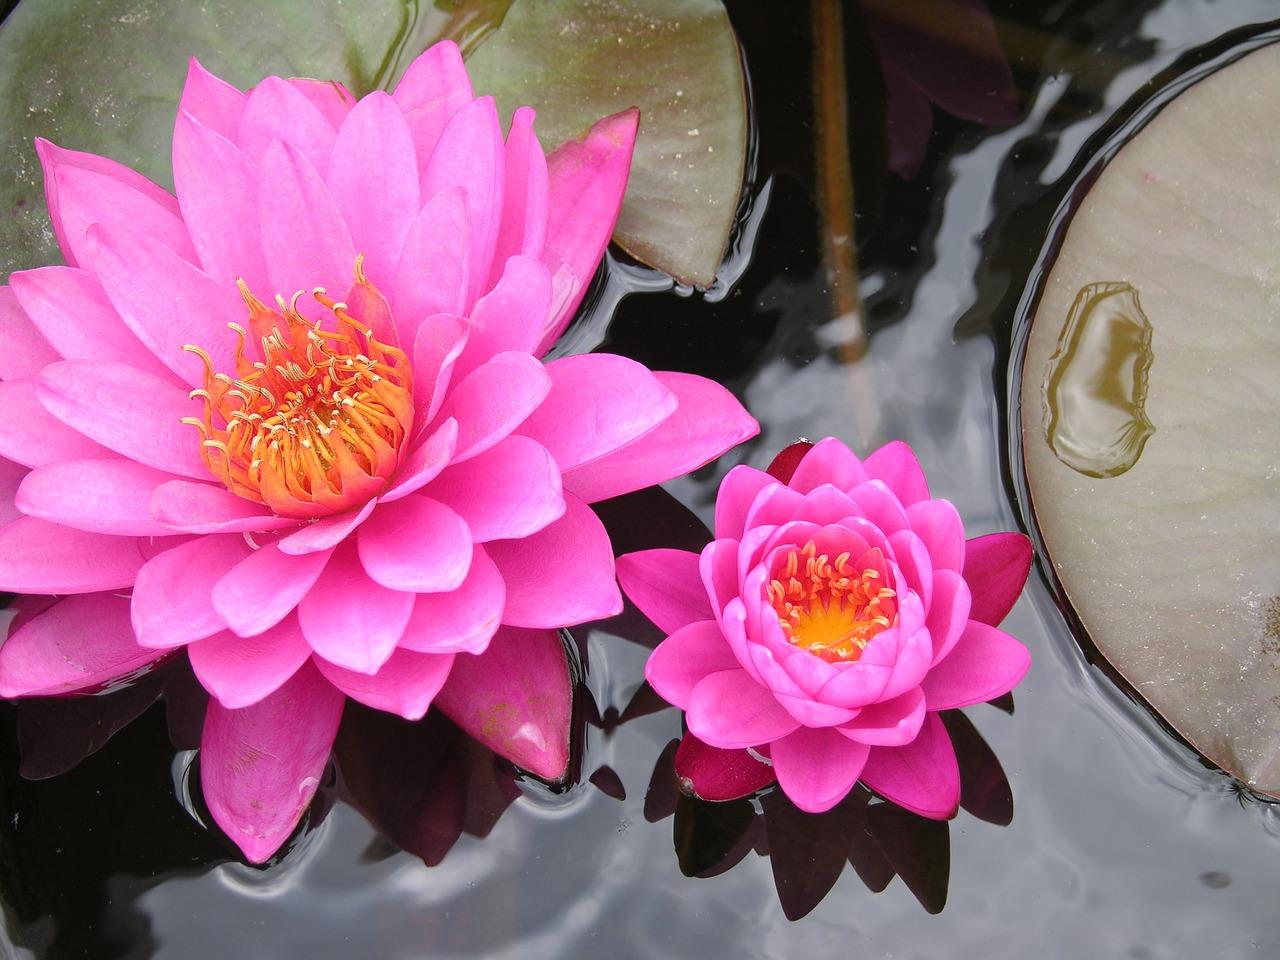 lily-pad-plaisirdetresoi-plaisir d etre soi-meditation-pleine conscience